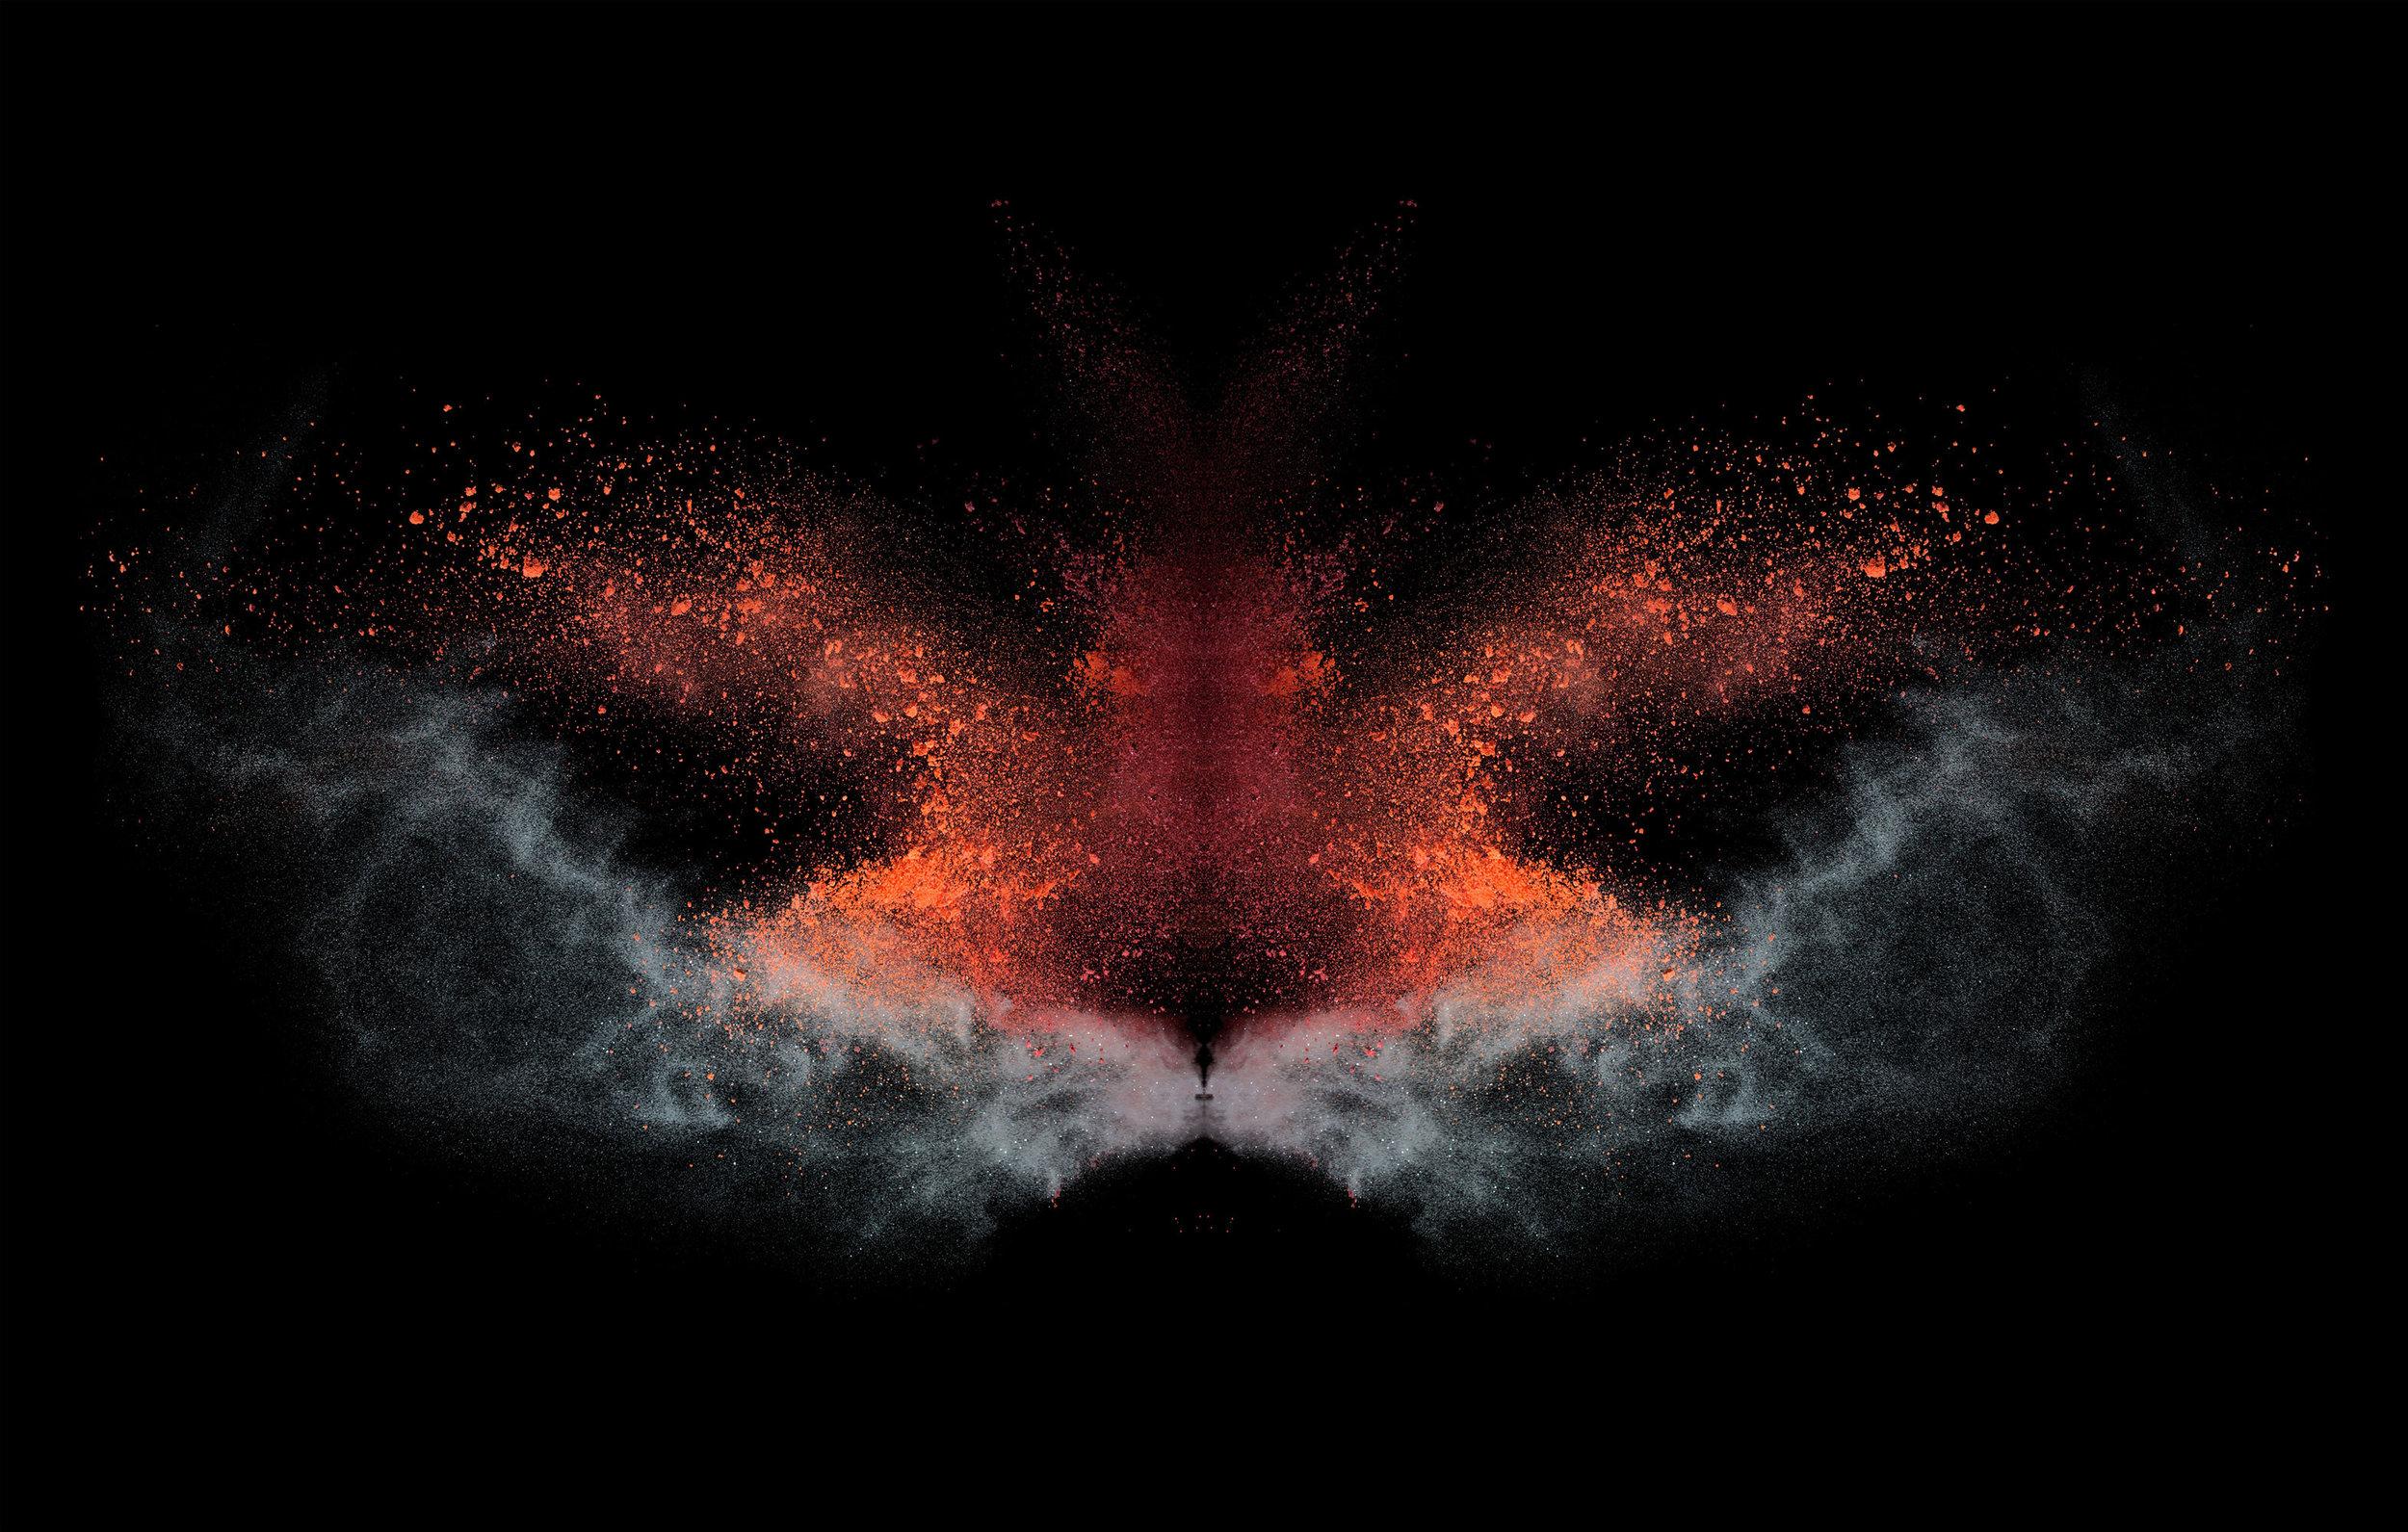 powder_butterfly_TIP-3143x2000.jpg